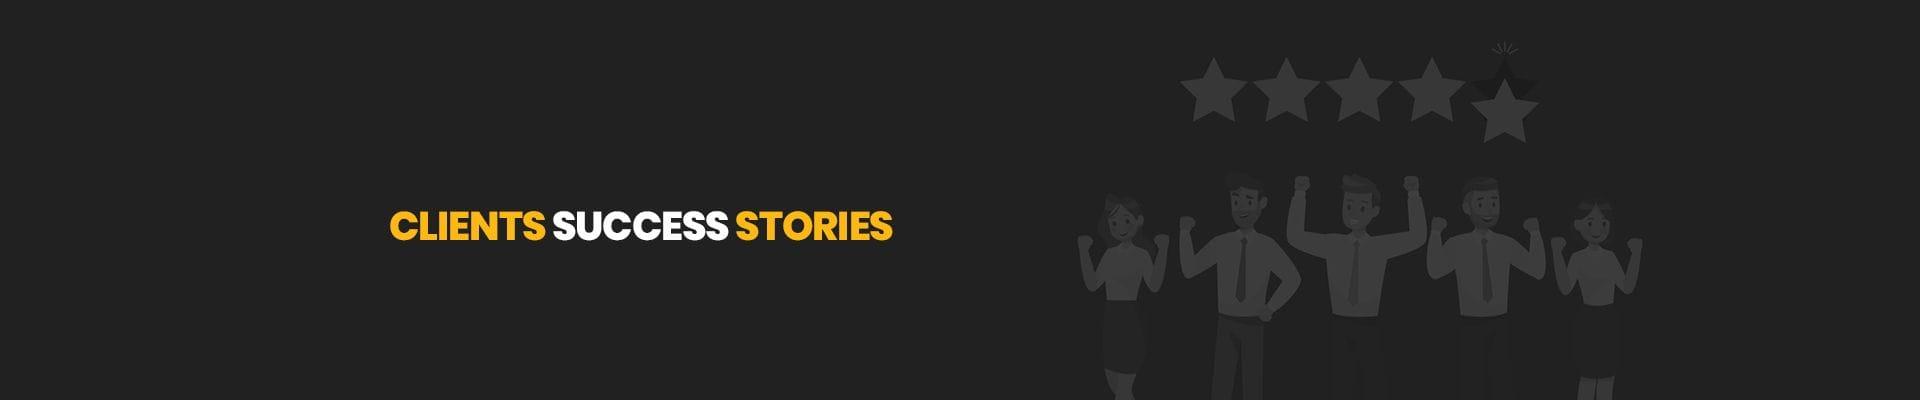 Bloomtools Client Testimonials | Bloomtools Client Success Stories